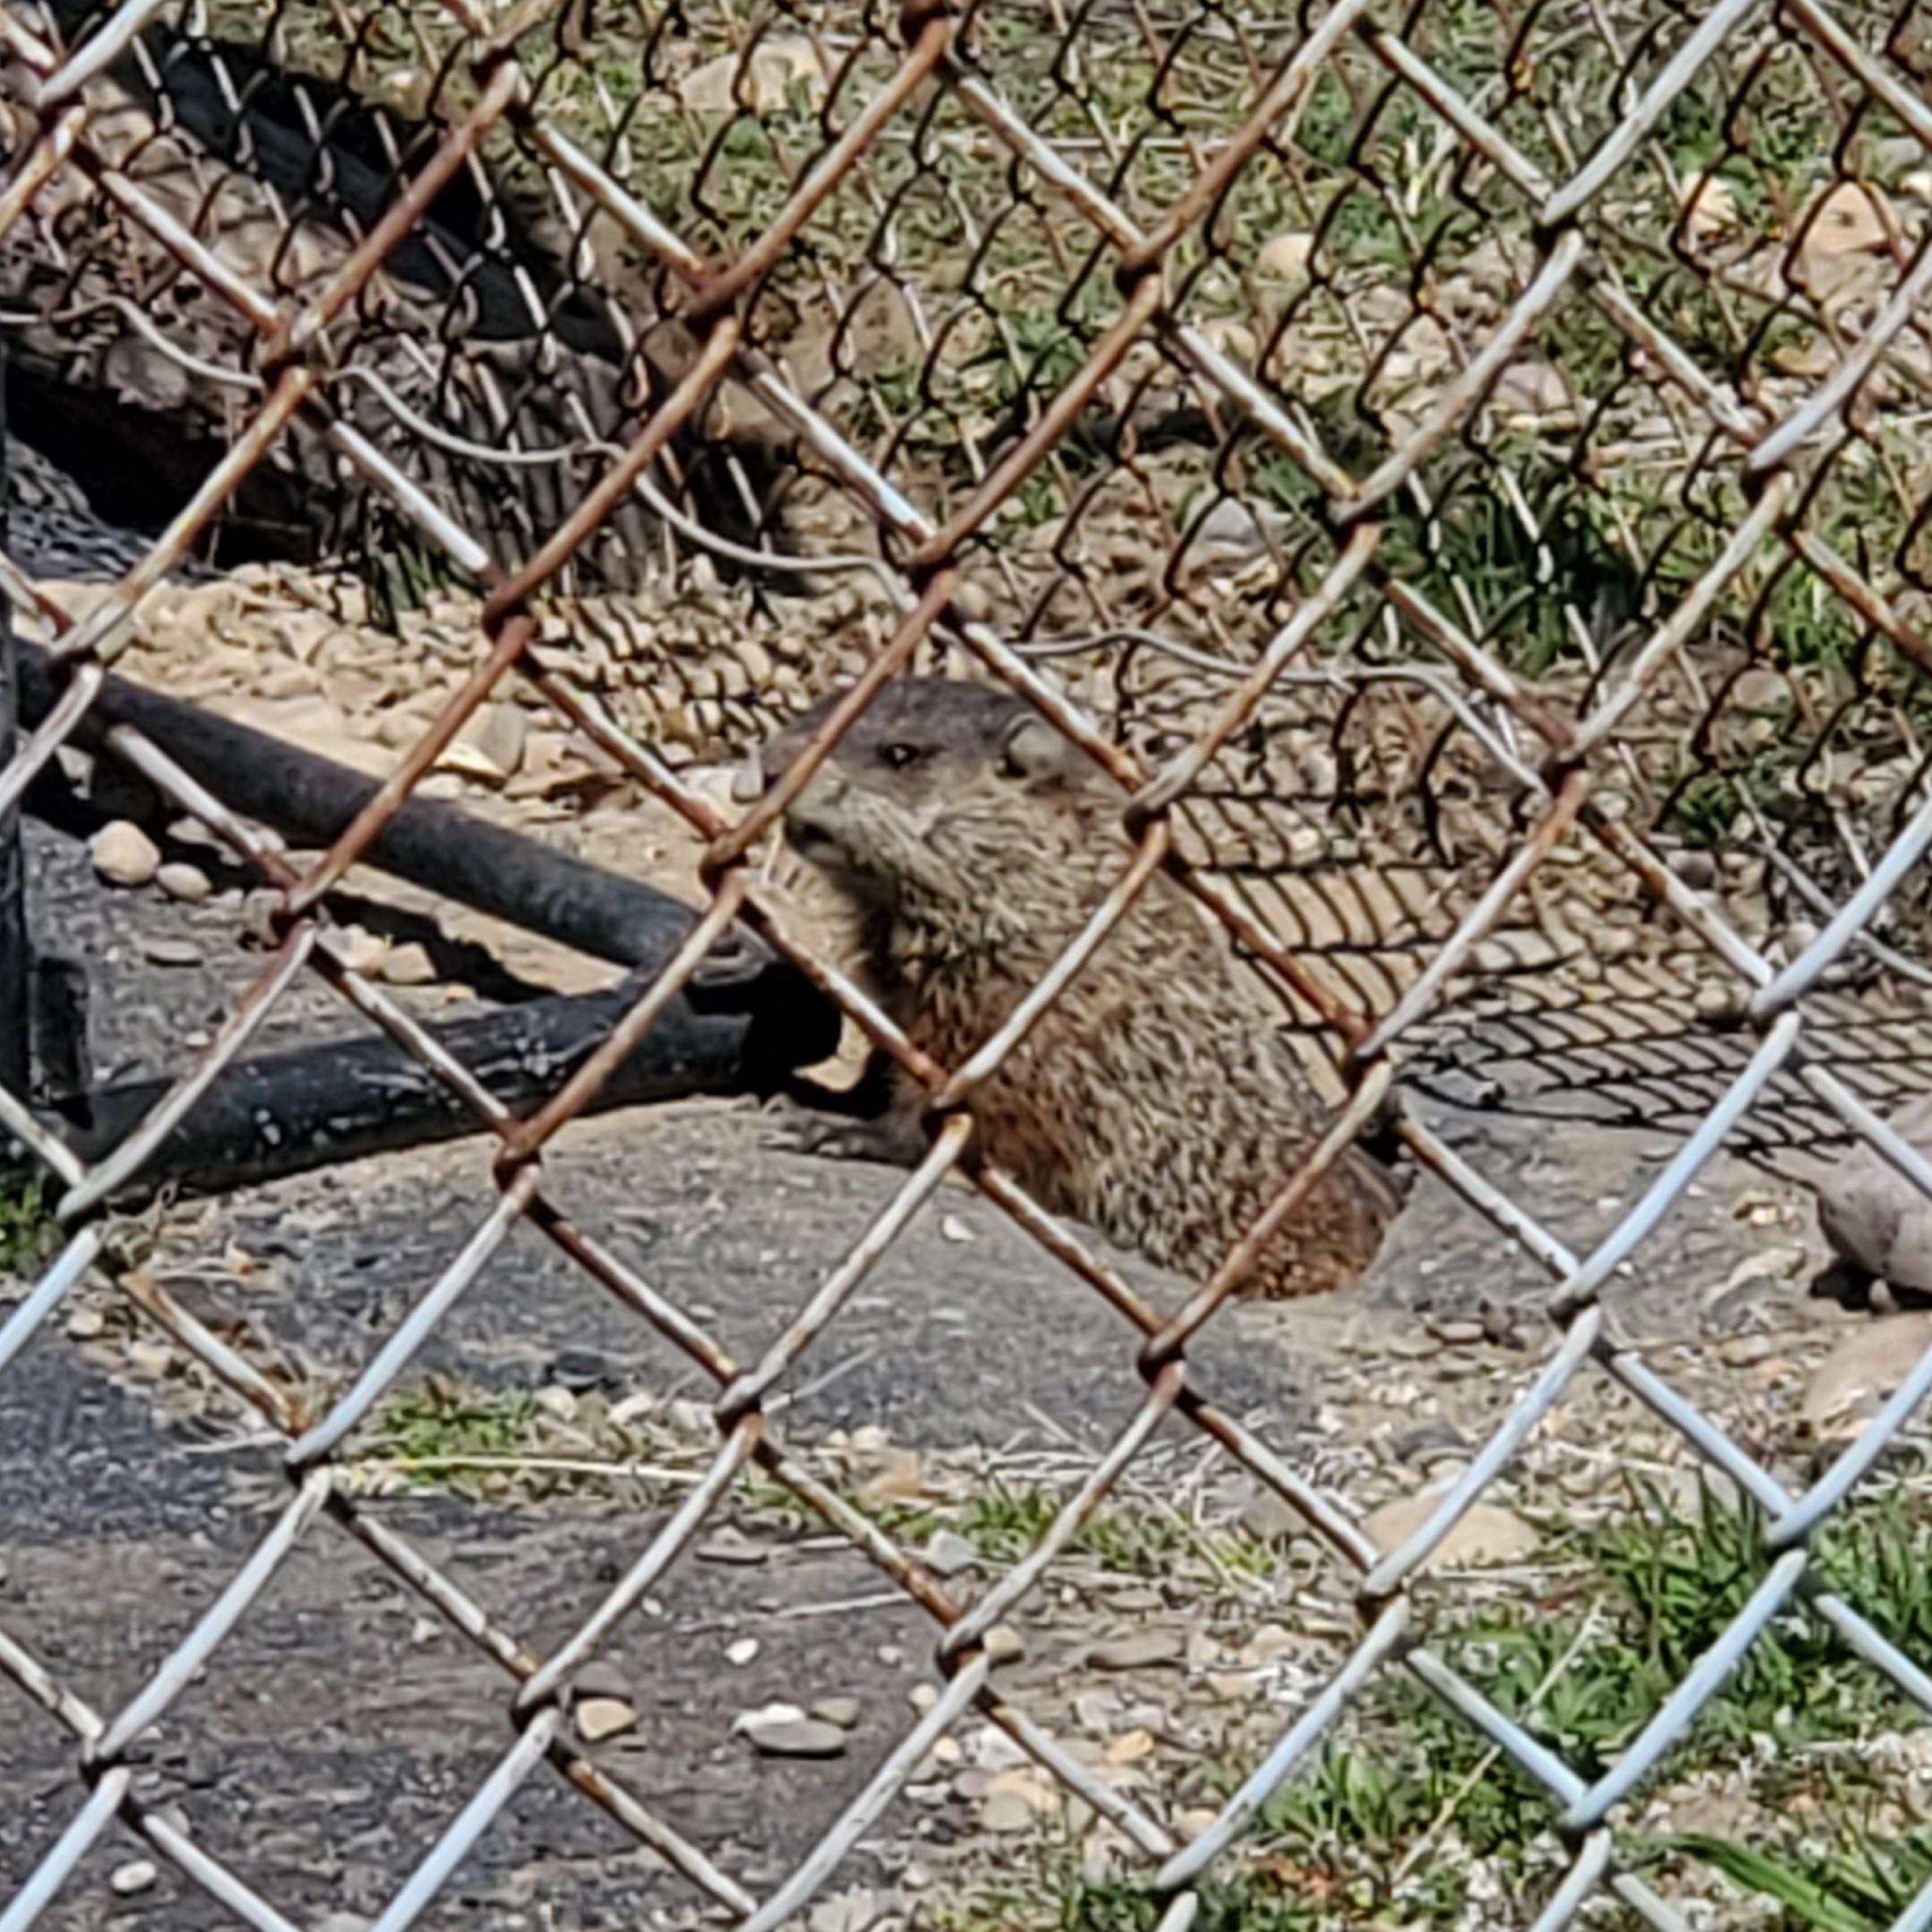 https://cdn.jasongaylord.com/images/2020/04/06/groundhog.jpg